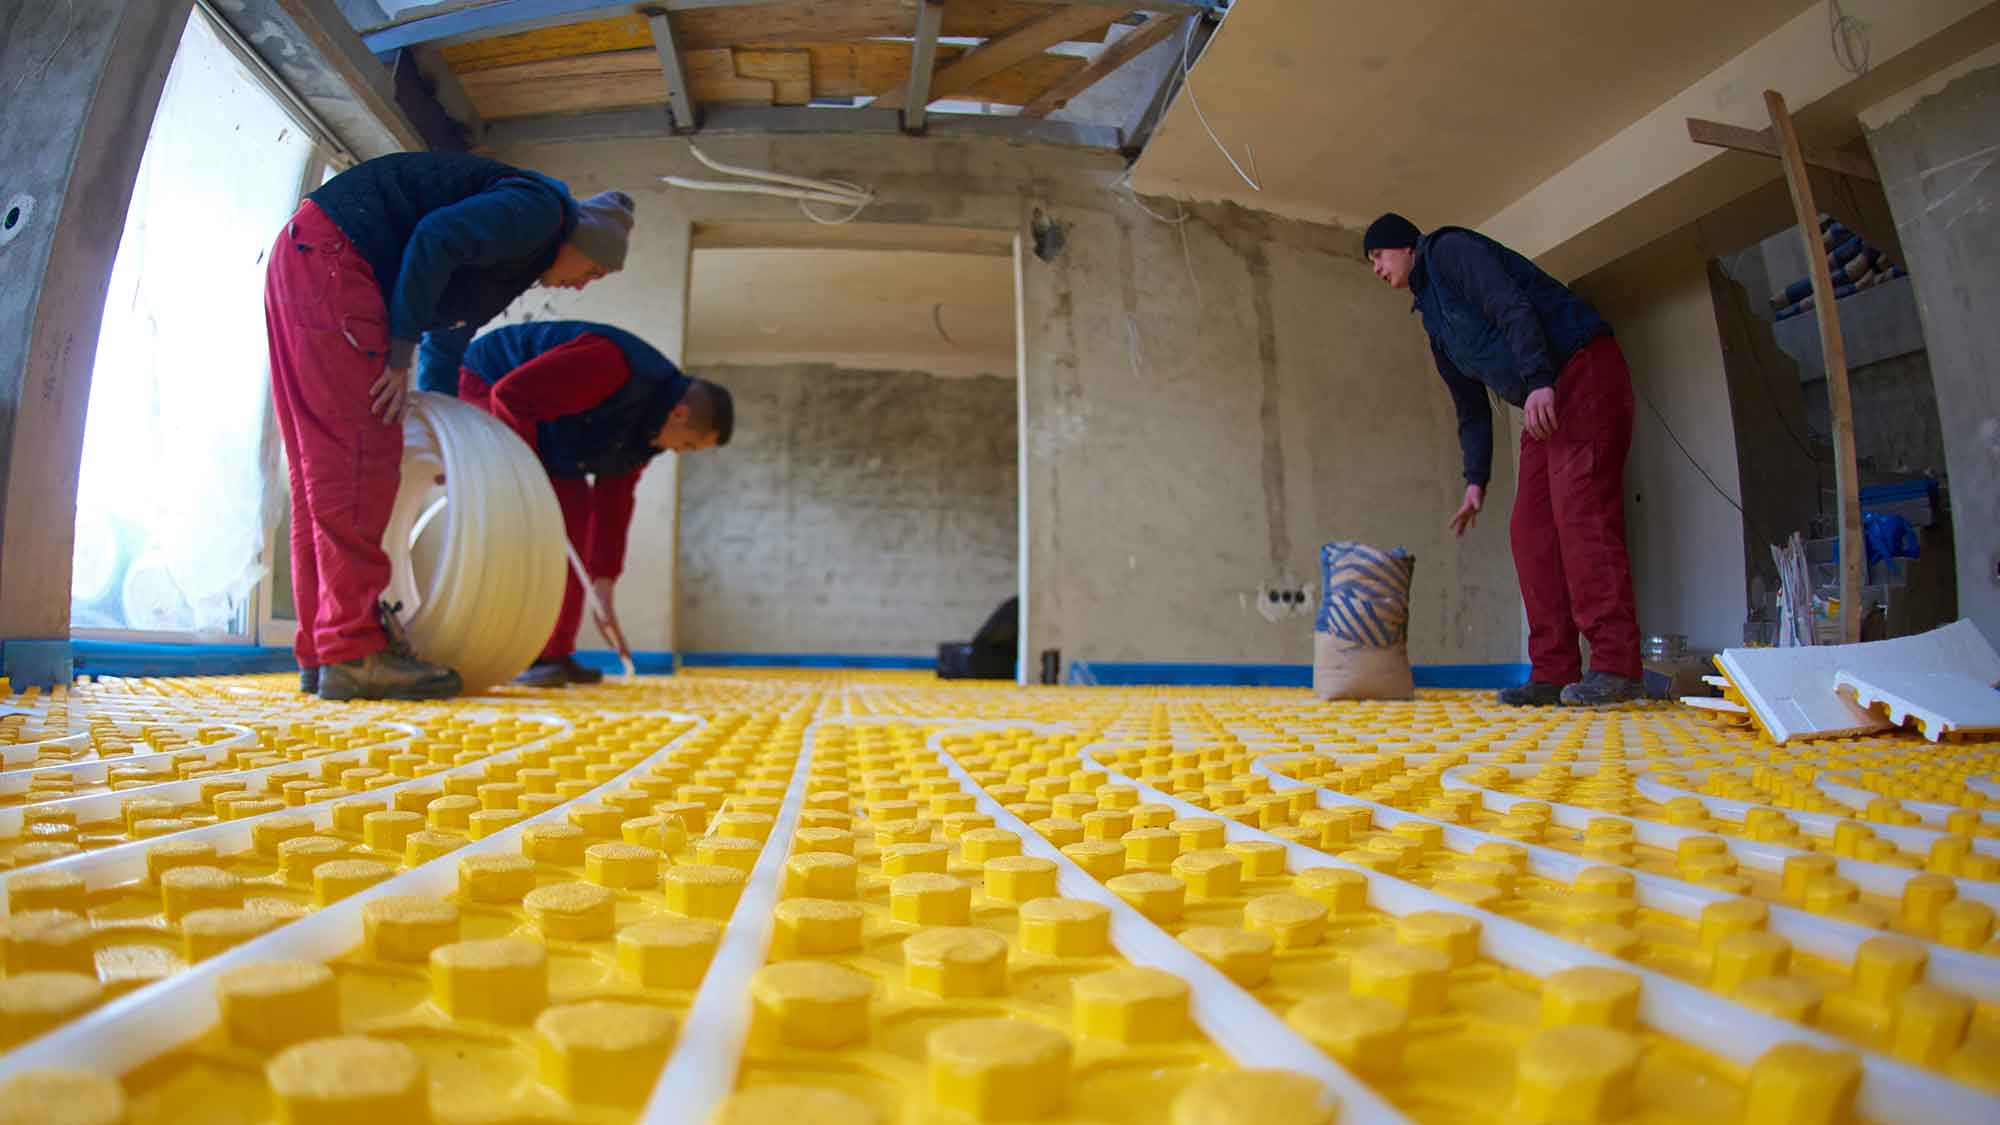 underfloor heating essex maintenance leigh on sea yellow